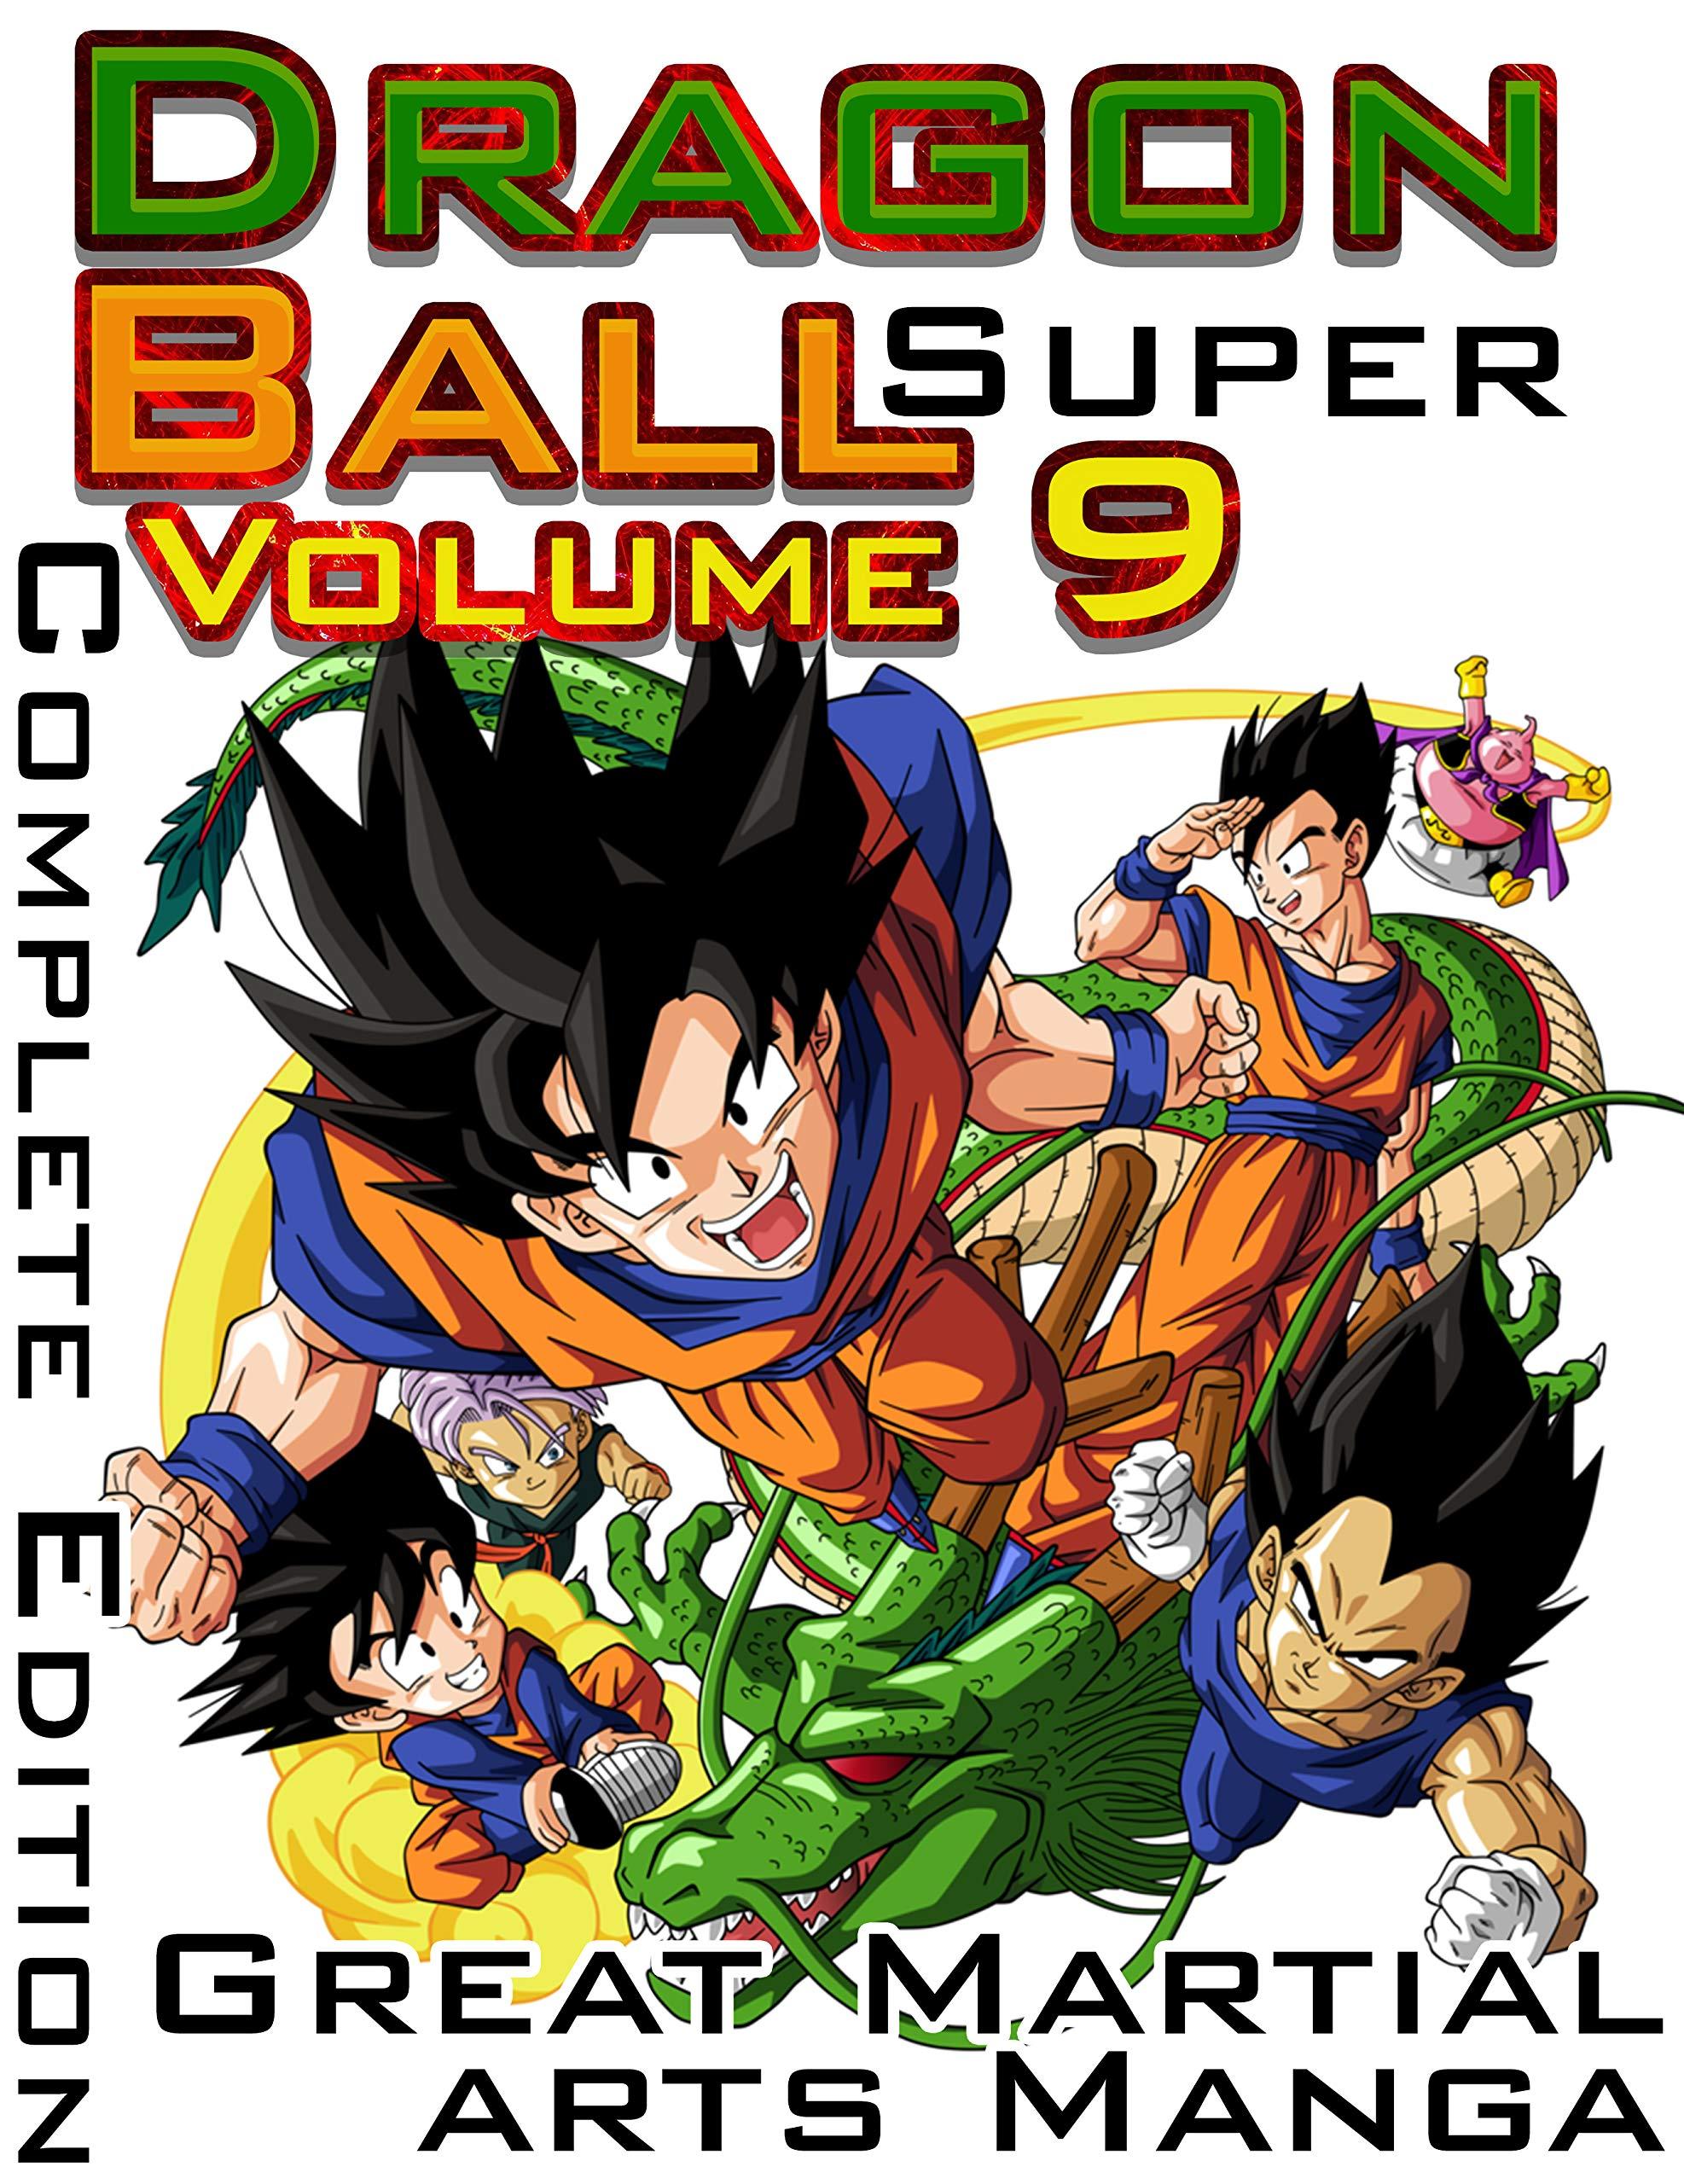 Great Martial arts Manga Dragon Ball Super Complete Edition: New Releases Dragon Ball Super Volume 9